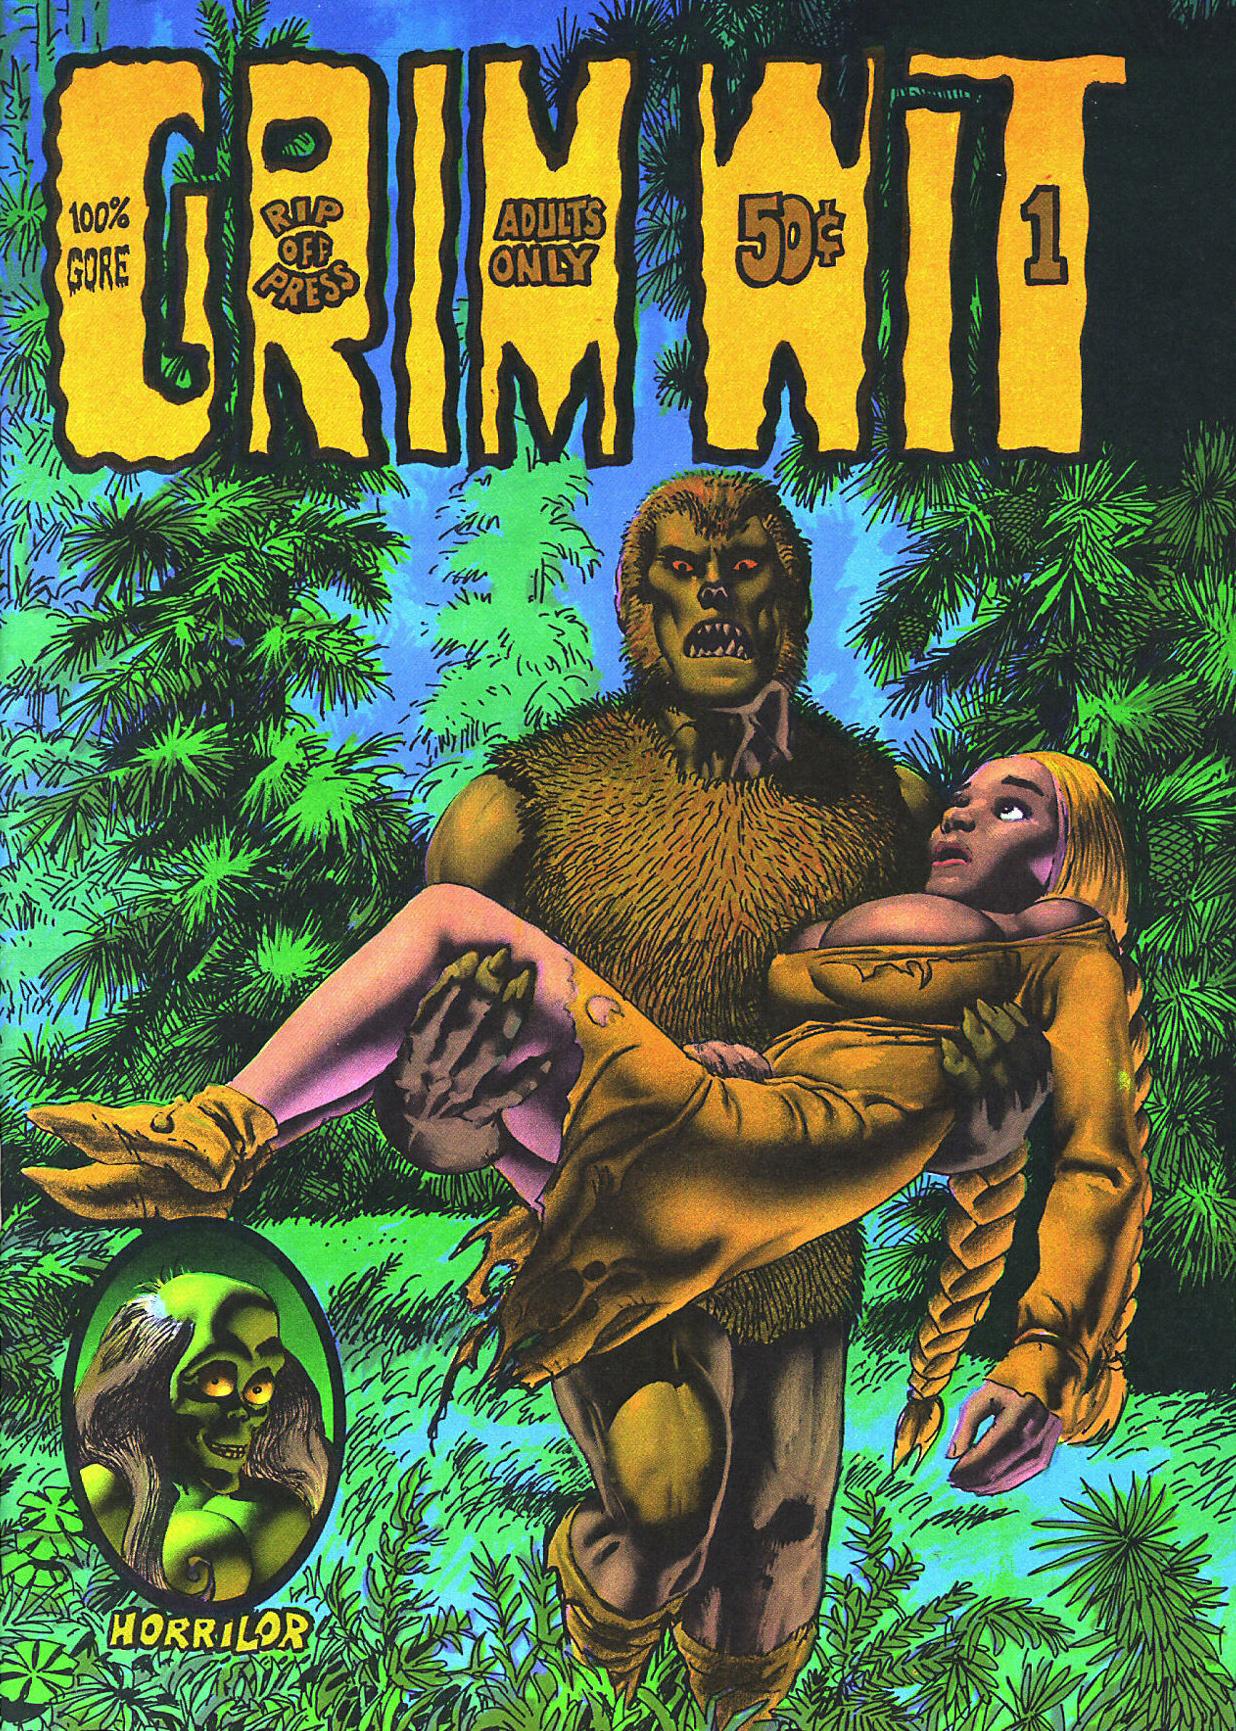 Richard Corben - Grim Wit #1 Cover (Last Gasp, 1972)